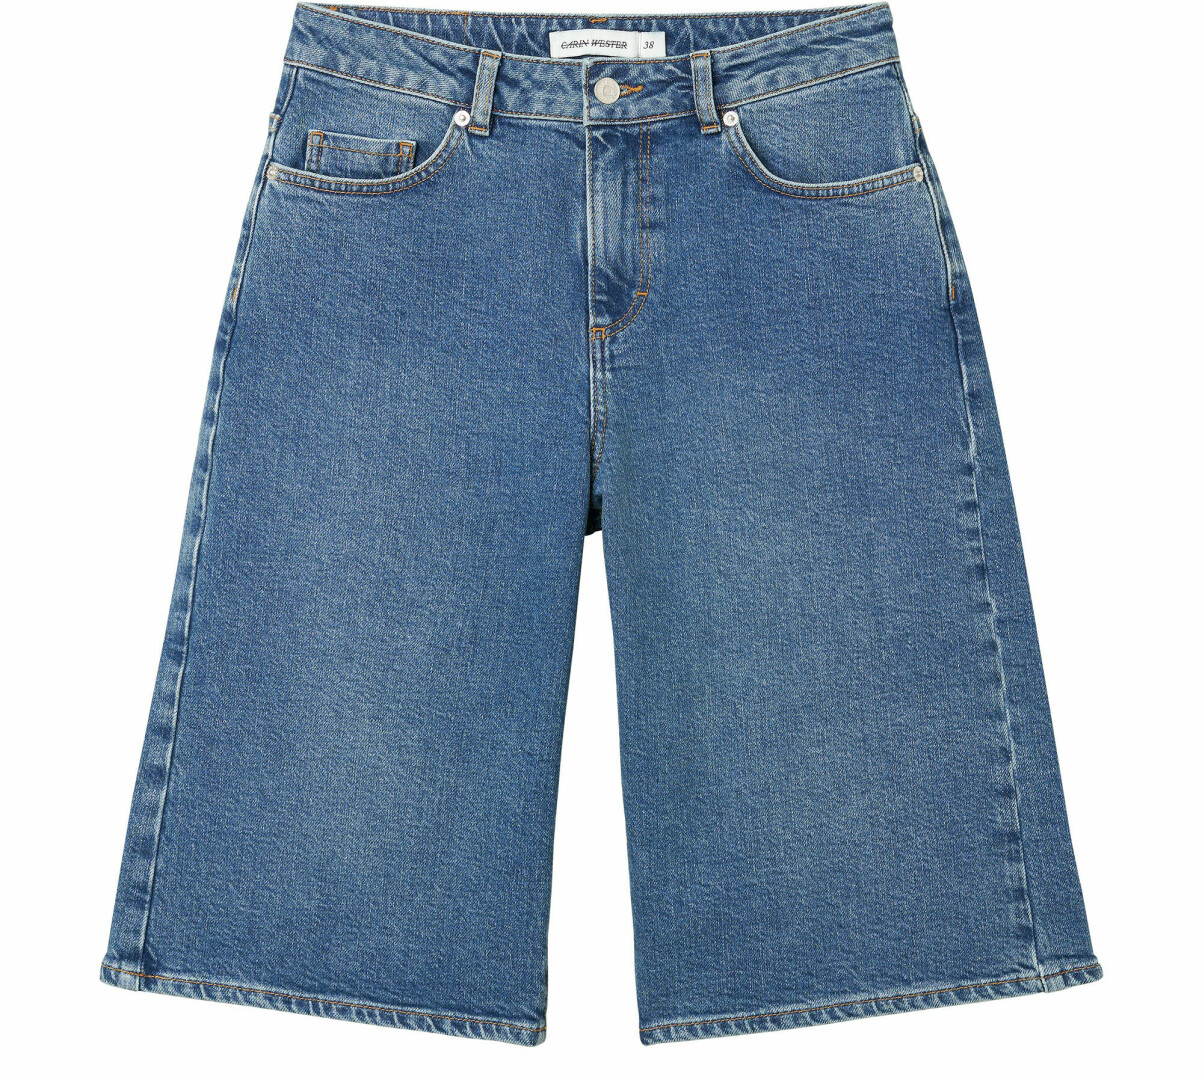 jeanshorts dam